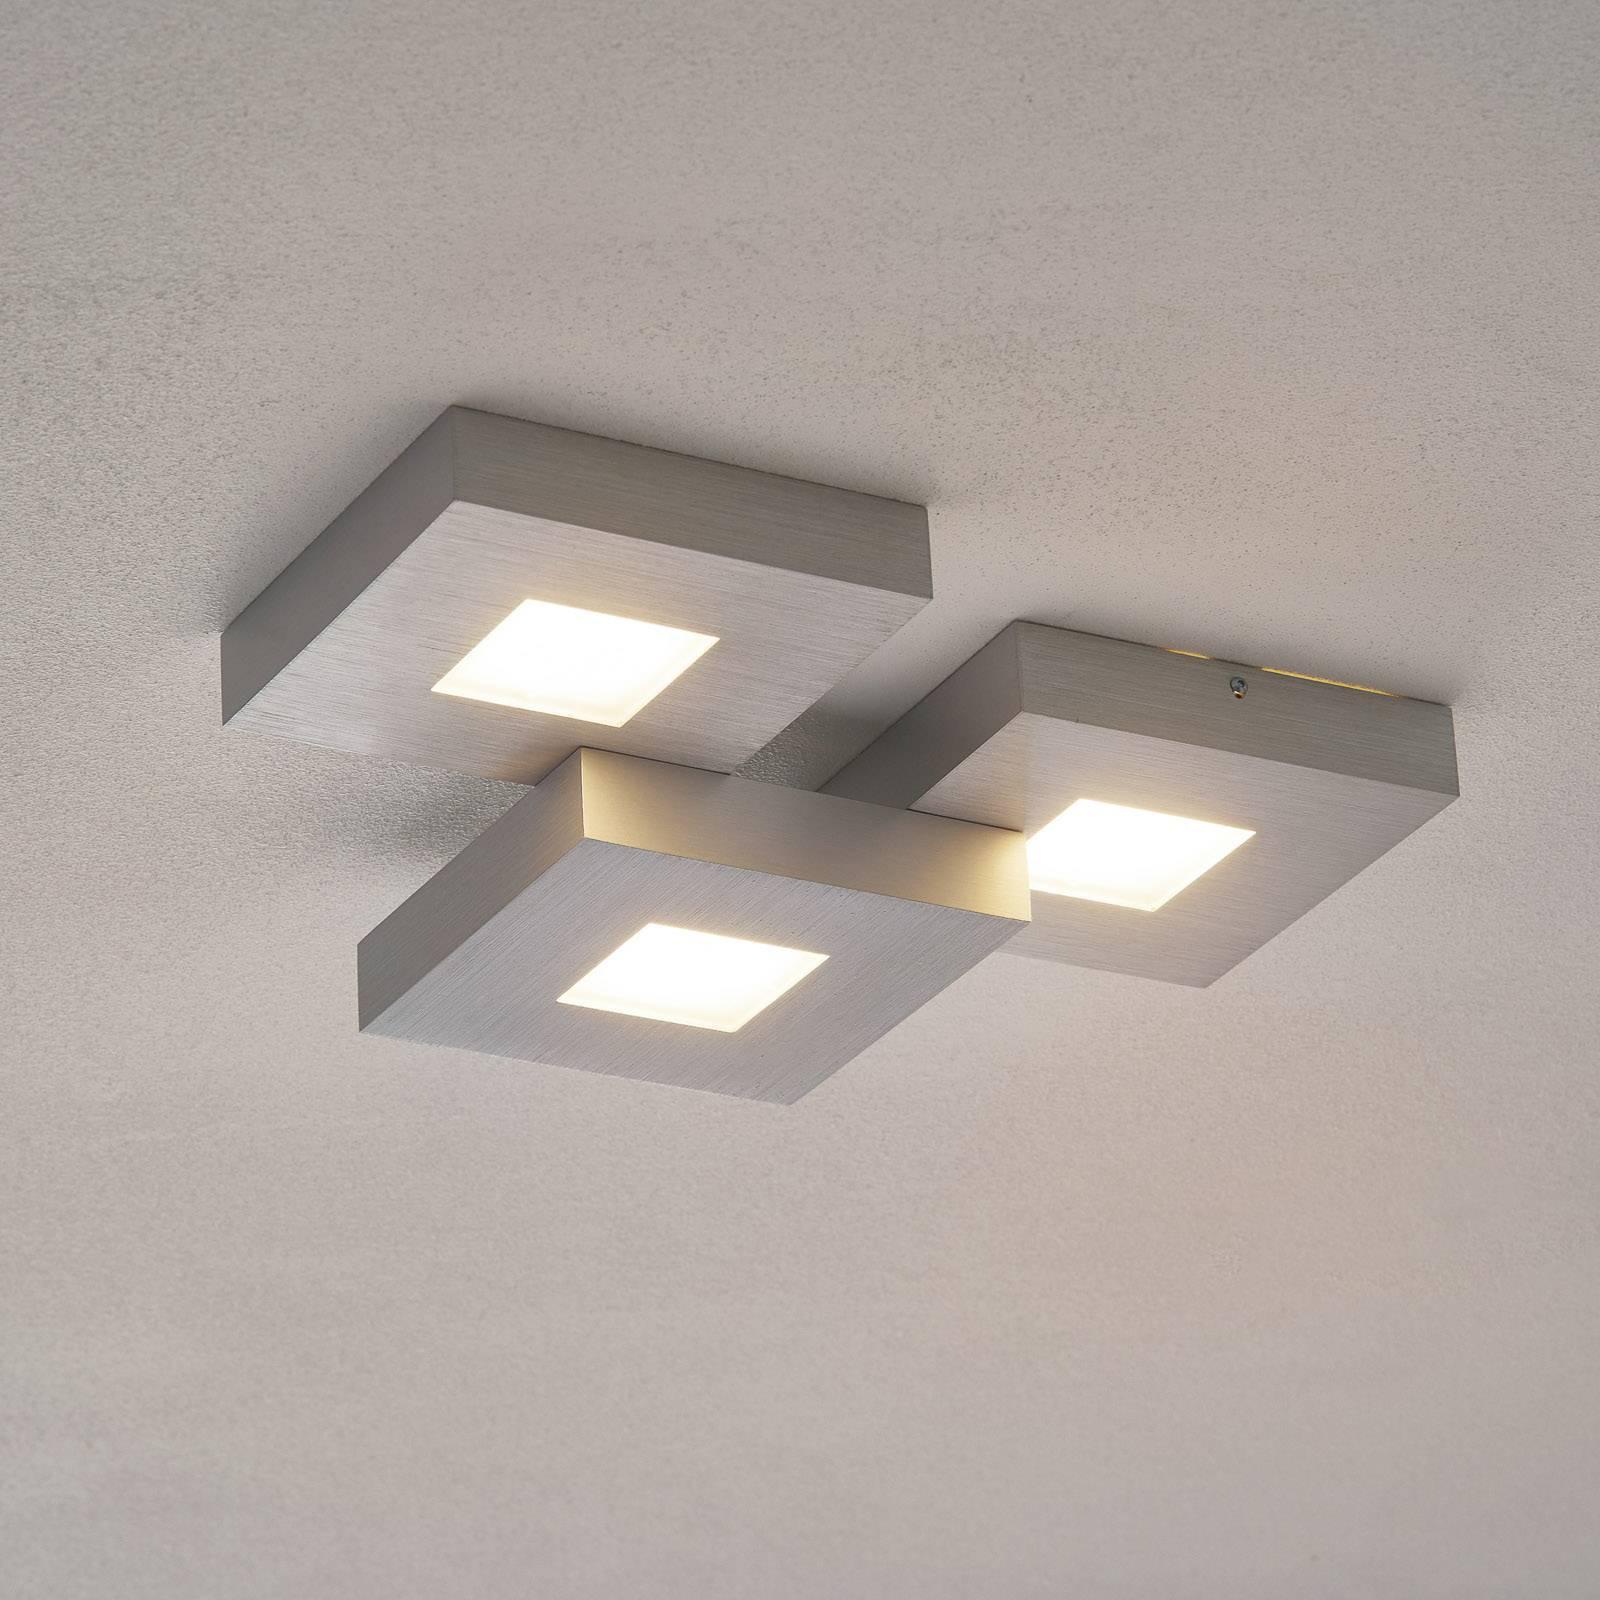 Cubus - 3-lamps LED-plafondlamp